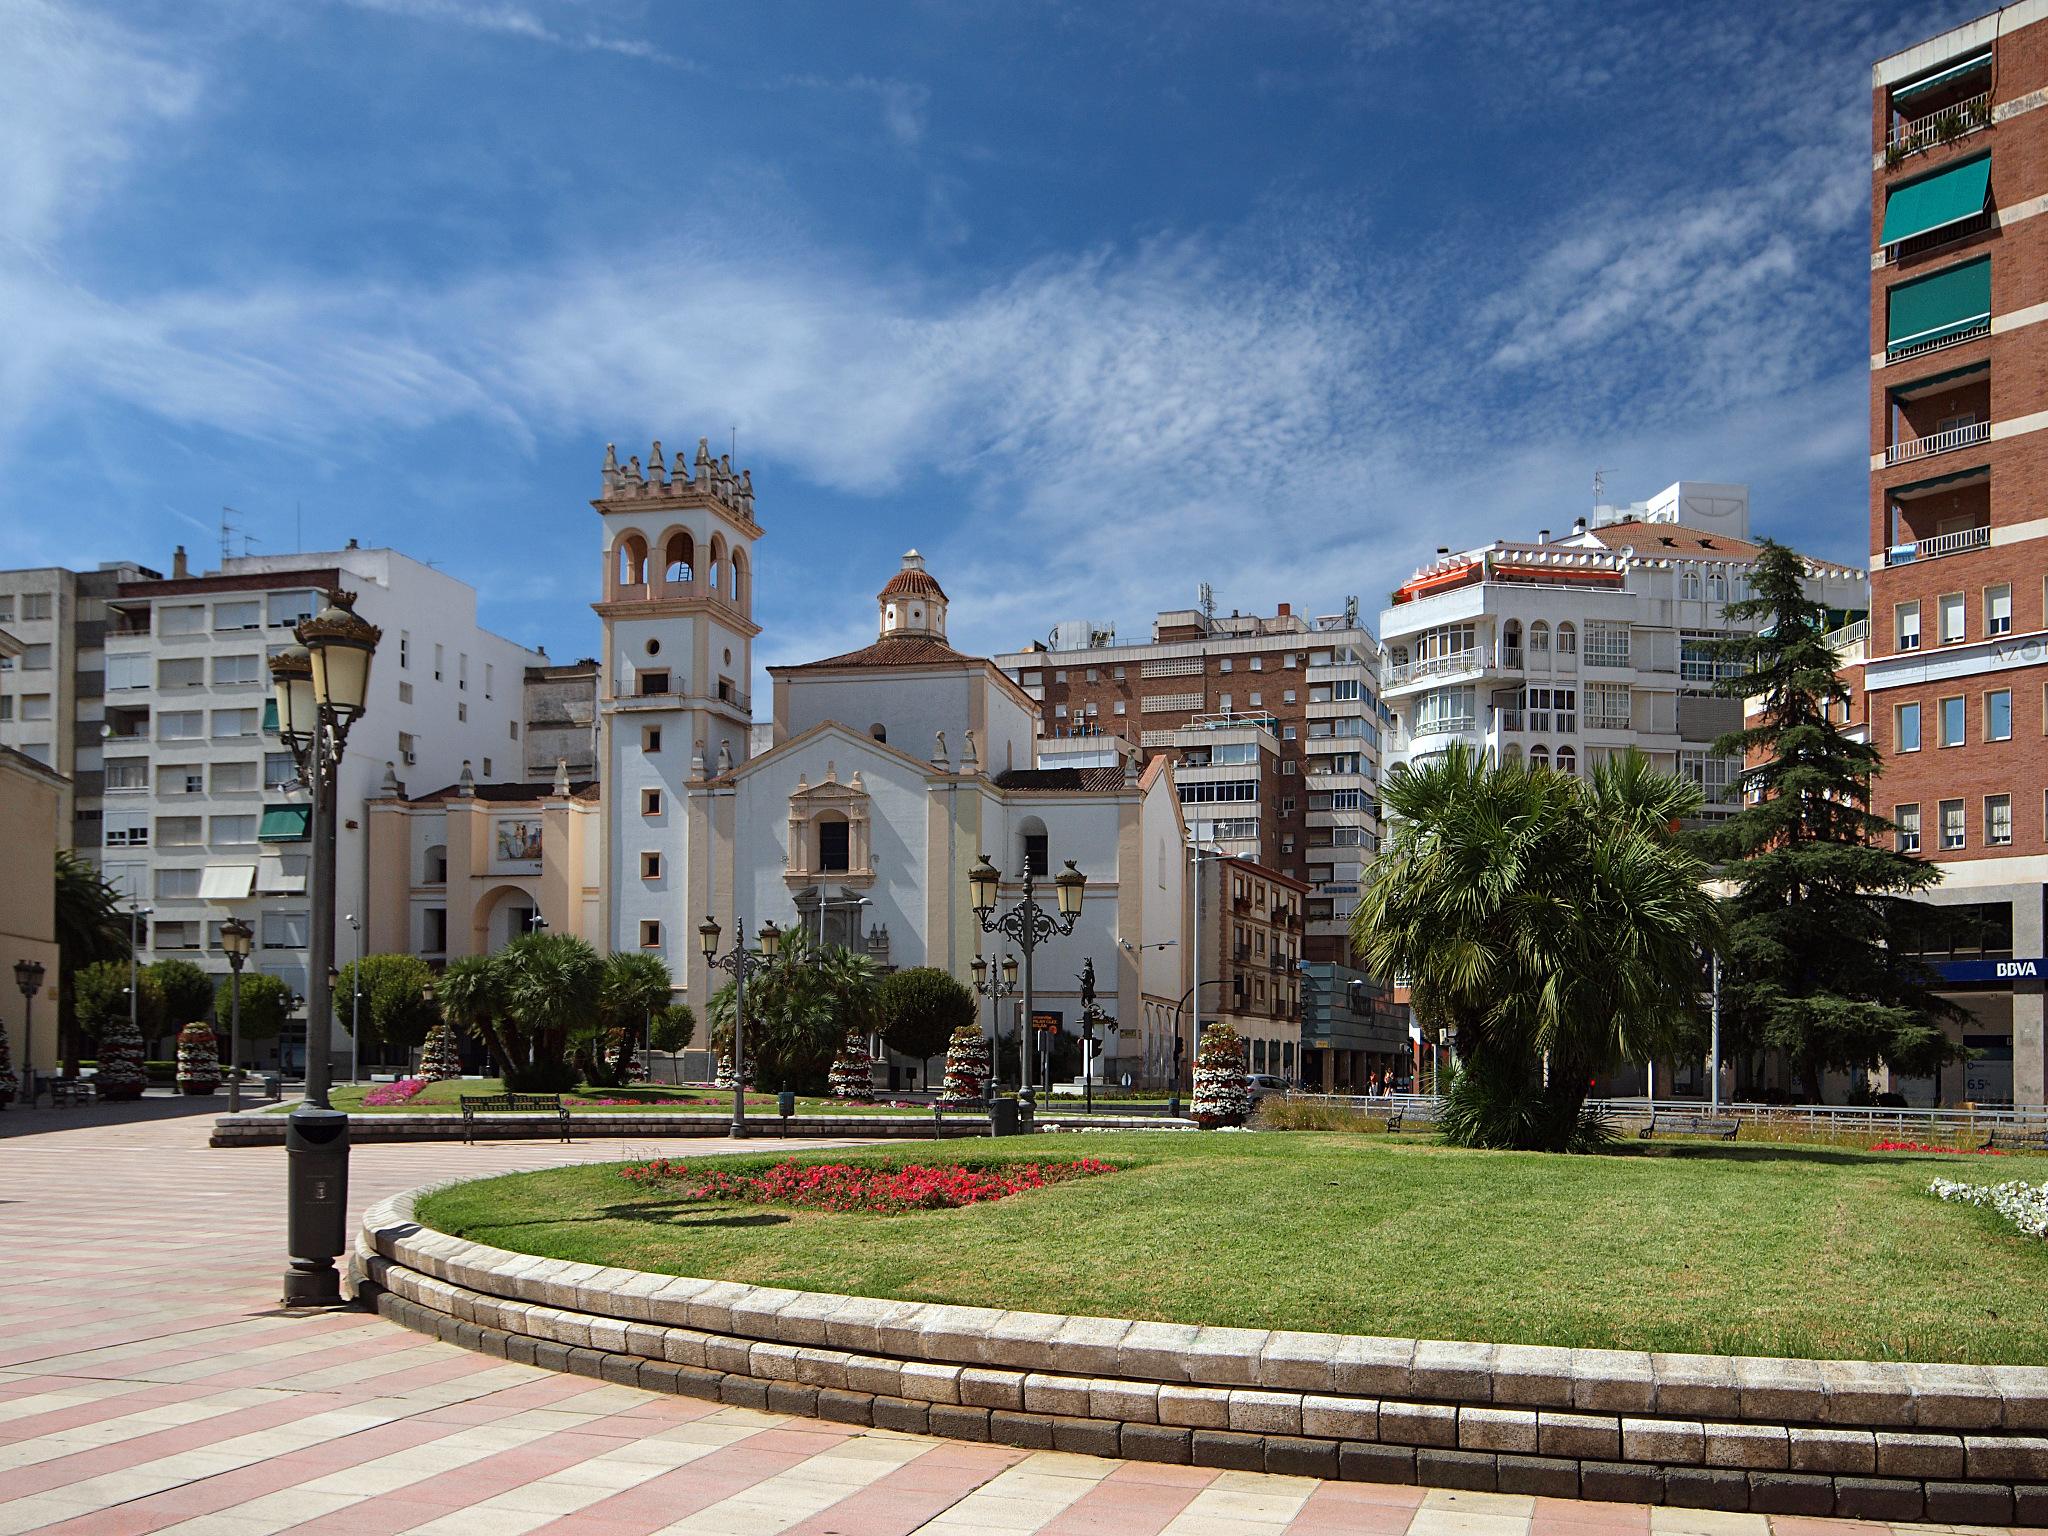 Archivo badajoz plaza san at n wikipedia la for Distribuidora de recambios badajoz